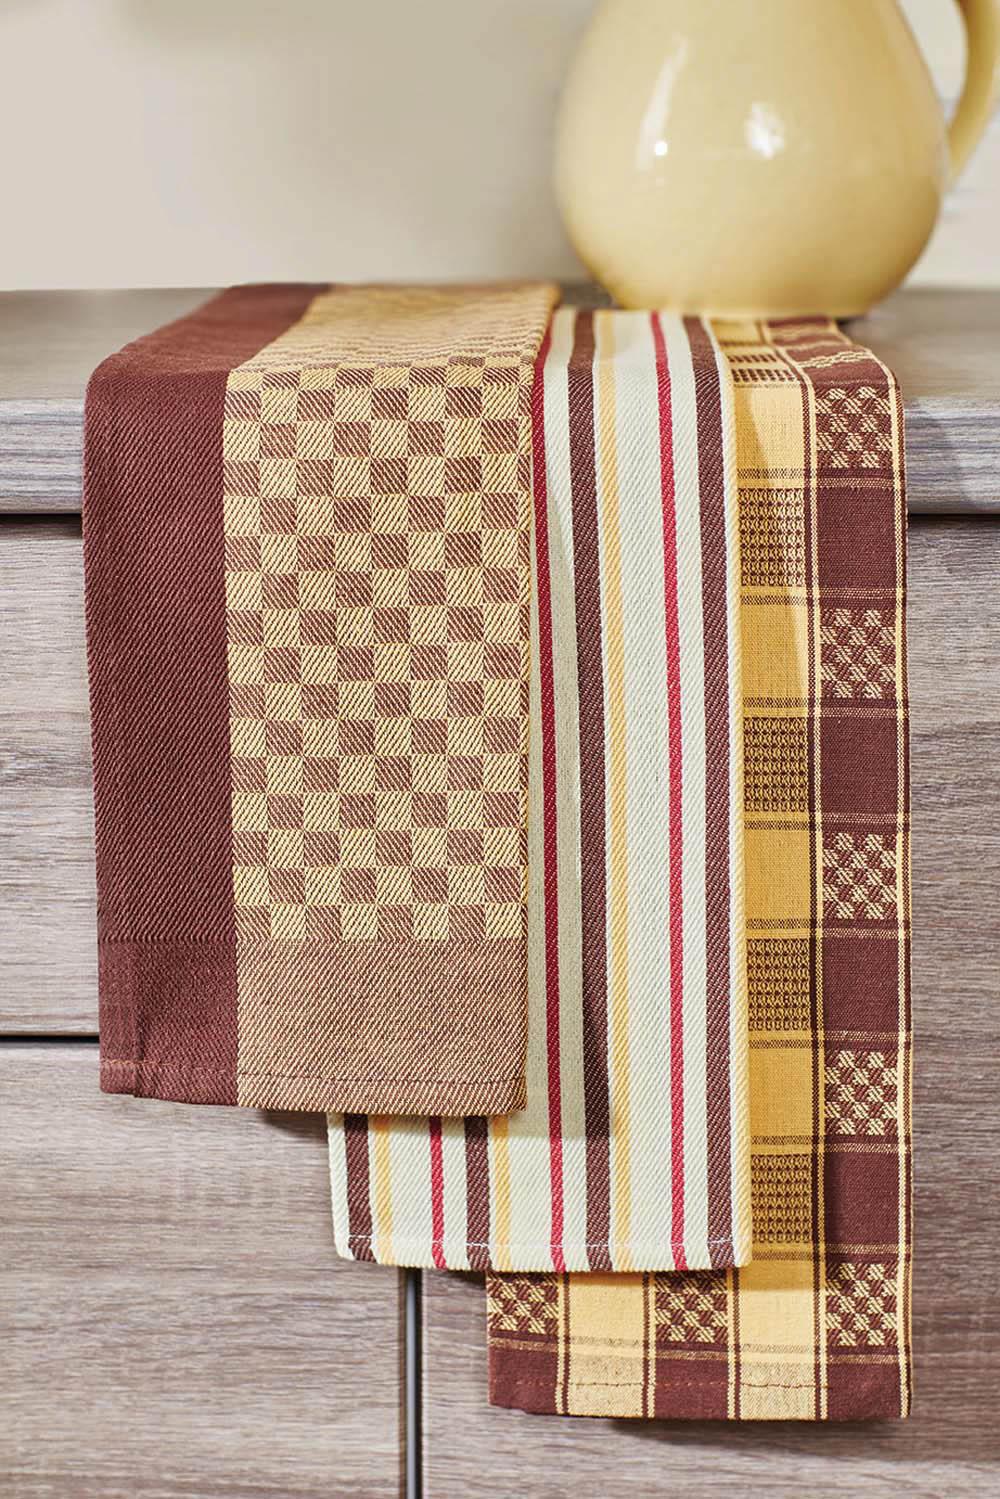 {} Primavelle Кухонное полотенце Jaycee Цвет: Коричневый (40х60 см - 3 шт) цена и фото